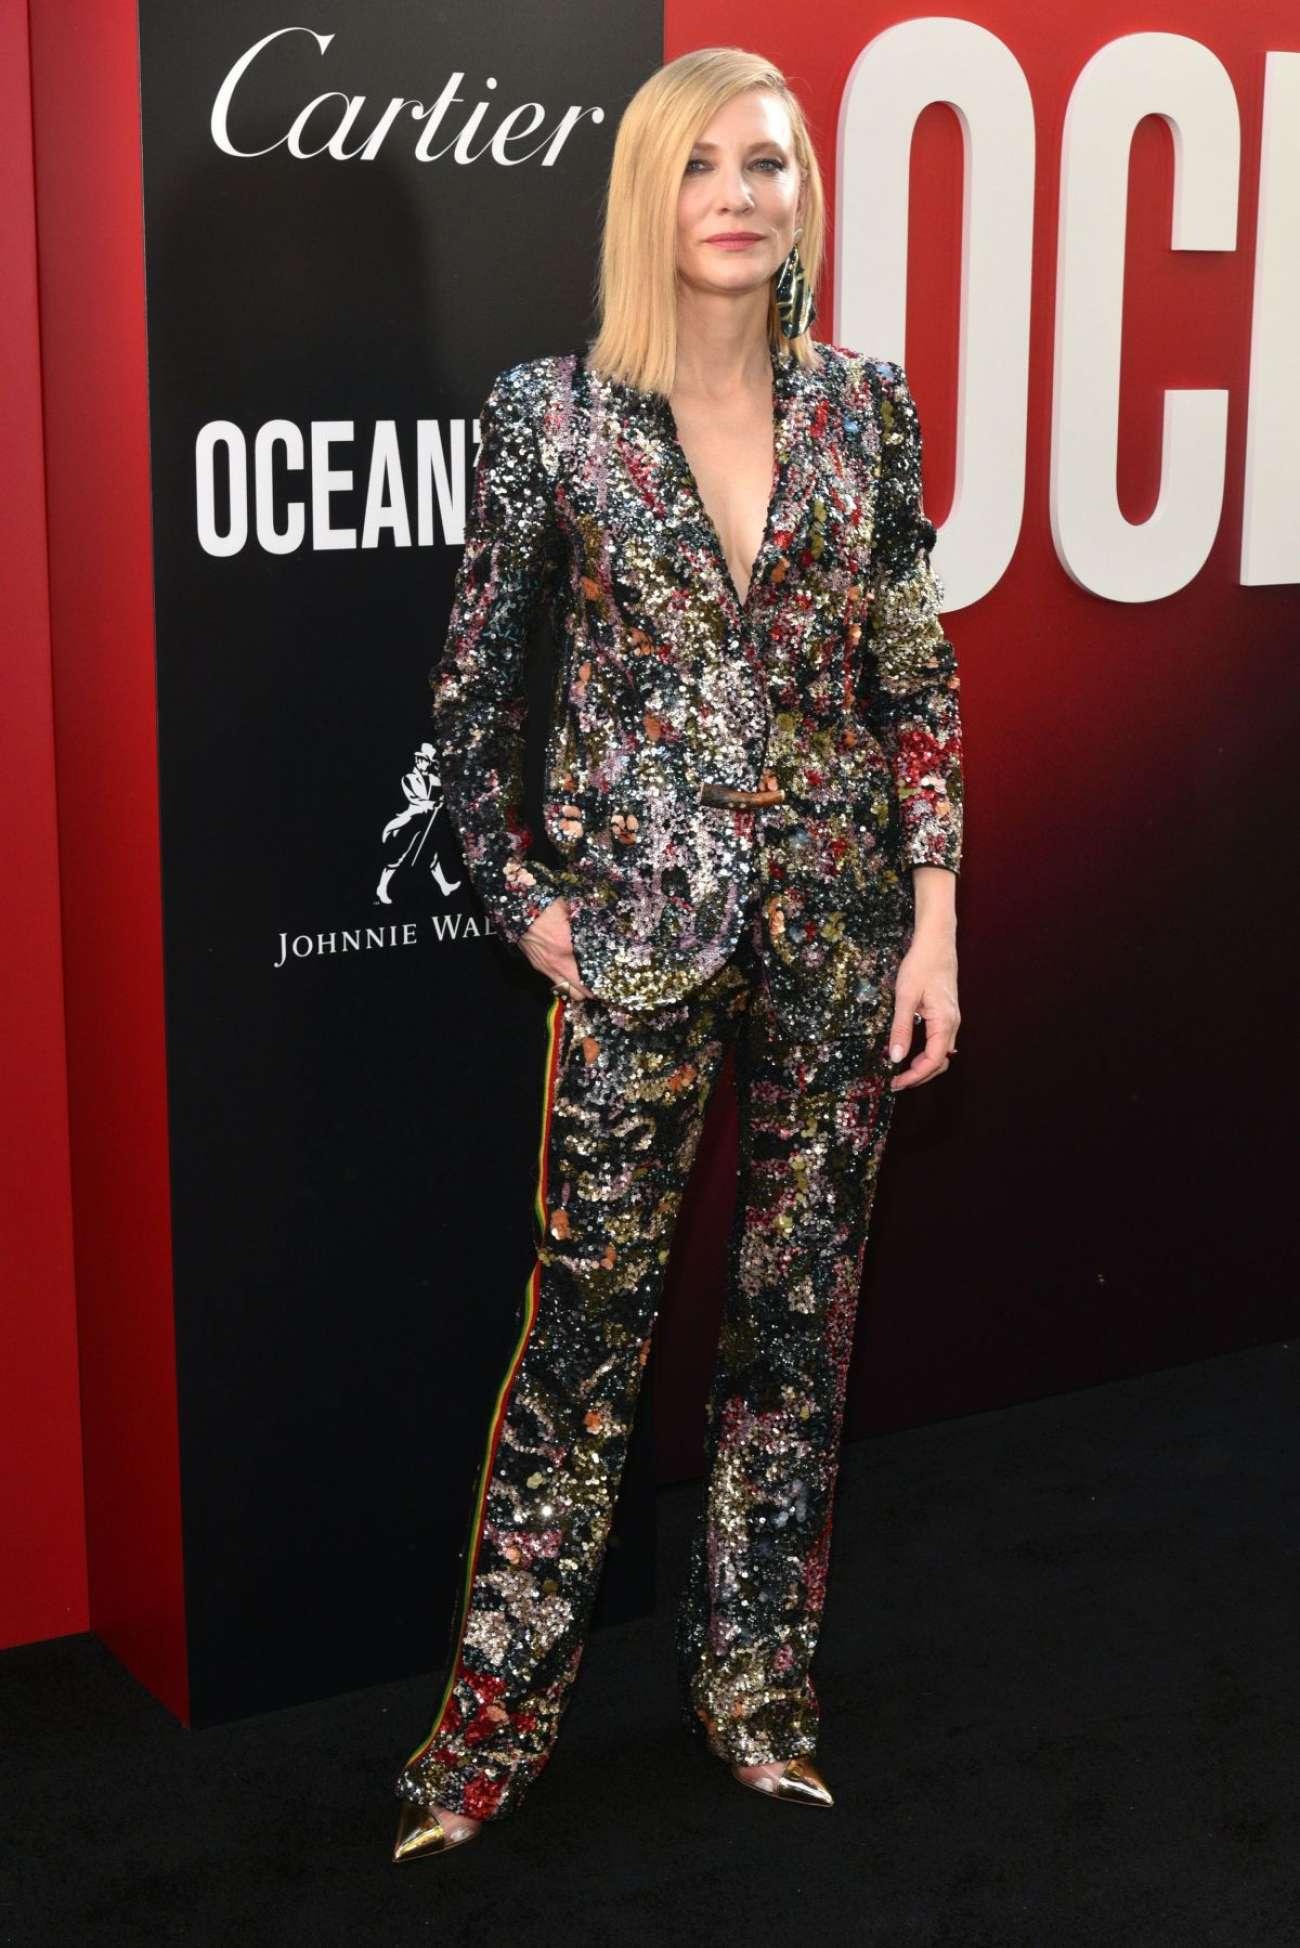 Cate Blanchett 2018 : Cate Blanchett: Ocean's 8 Premiere photocall In New York-01